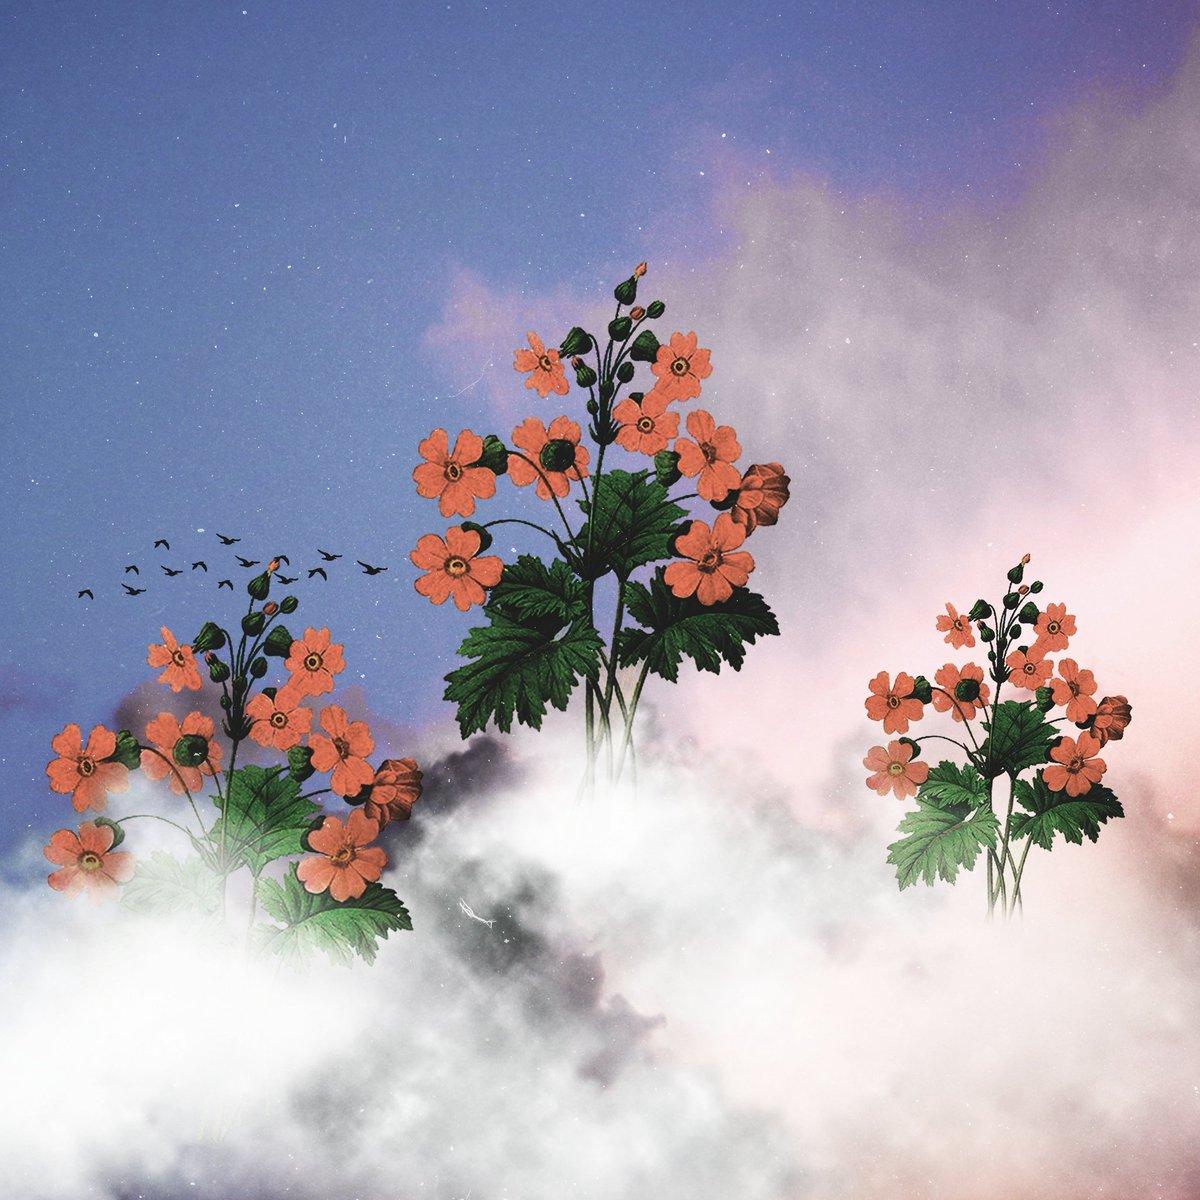 """Bloom"". Made on Photoshop.  #surrealism #surrealistart #graphicsdesign #digitalartpic.twitter.com/U0TQTzpL1F"